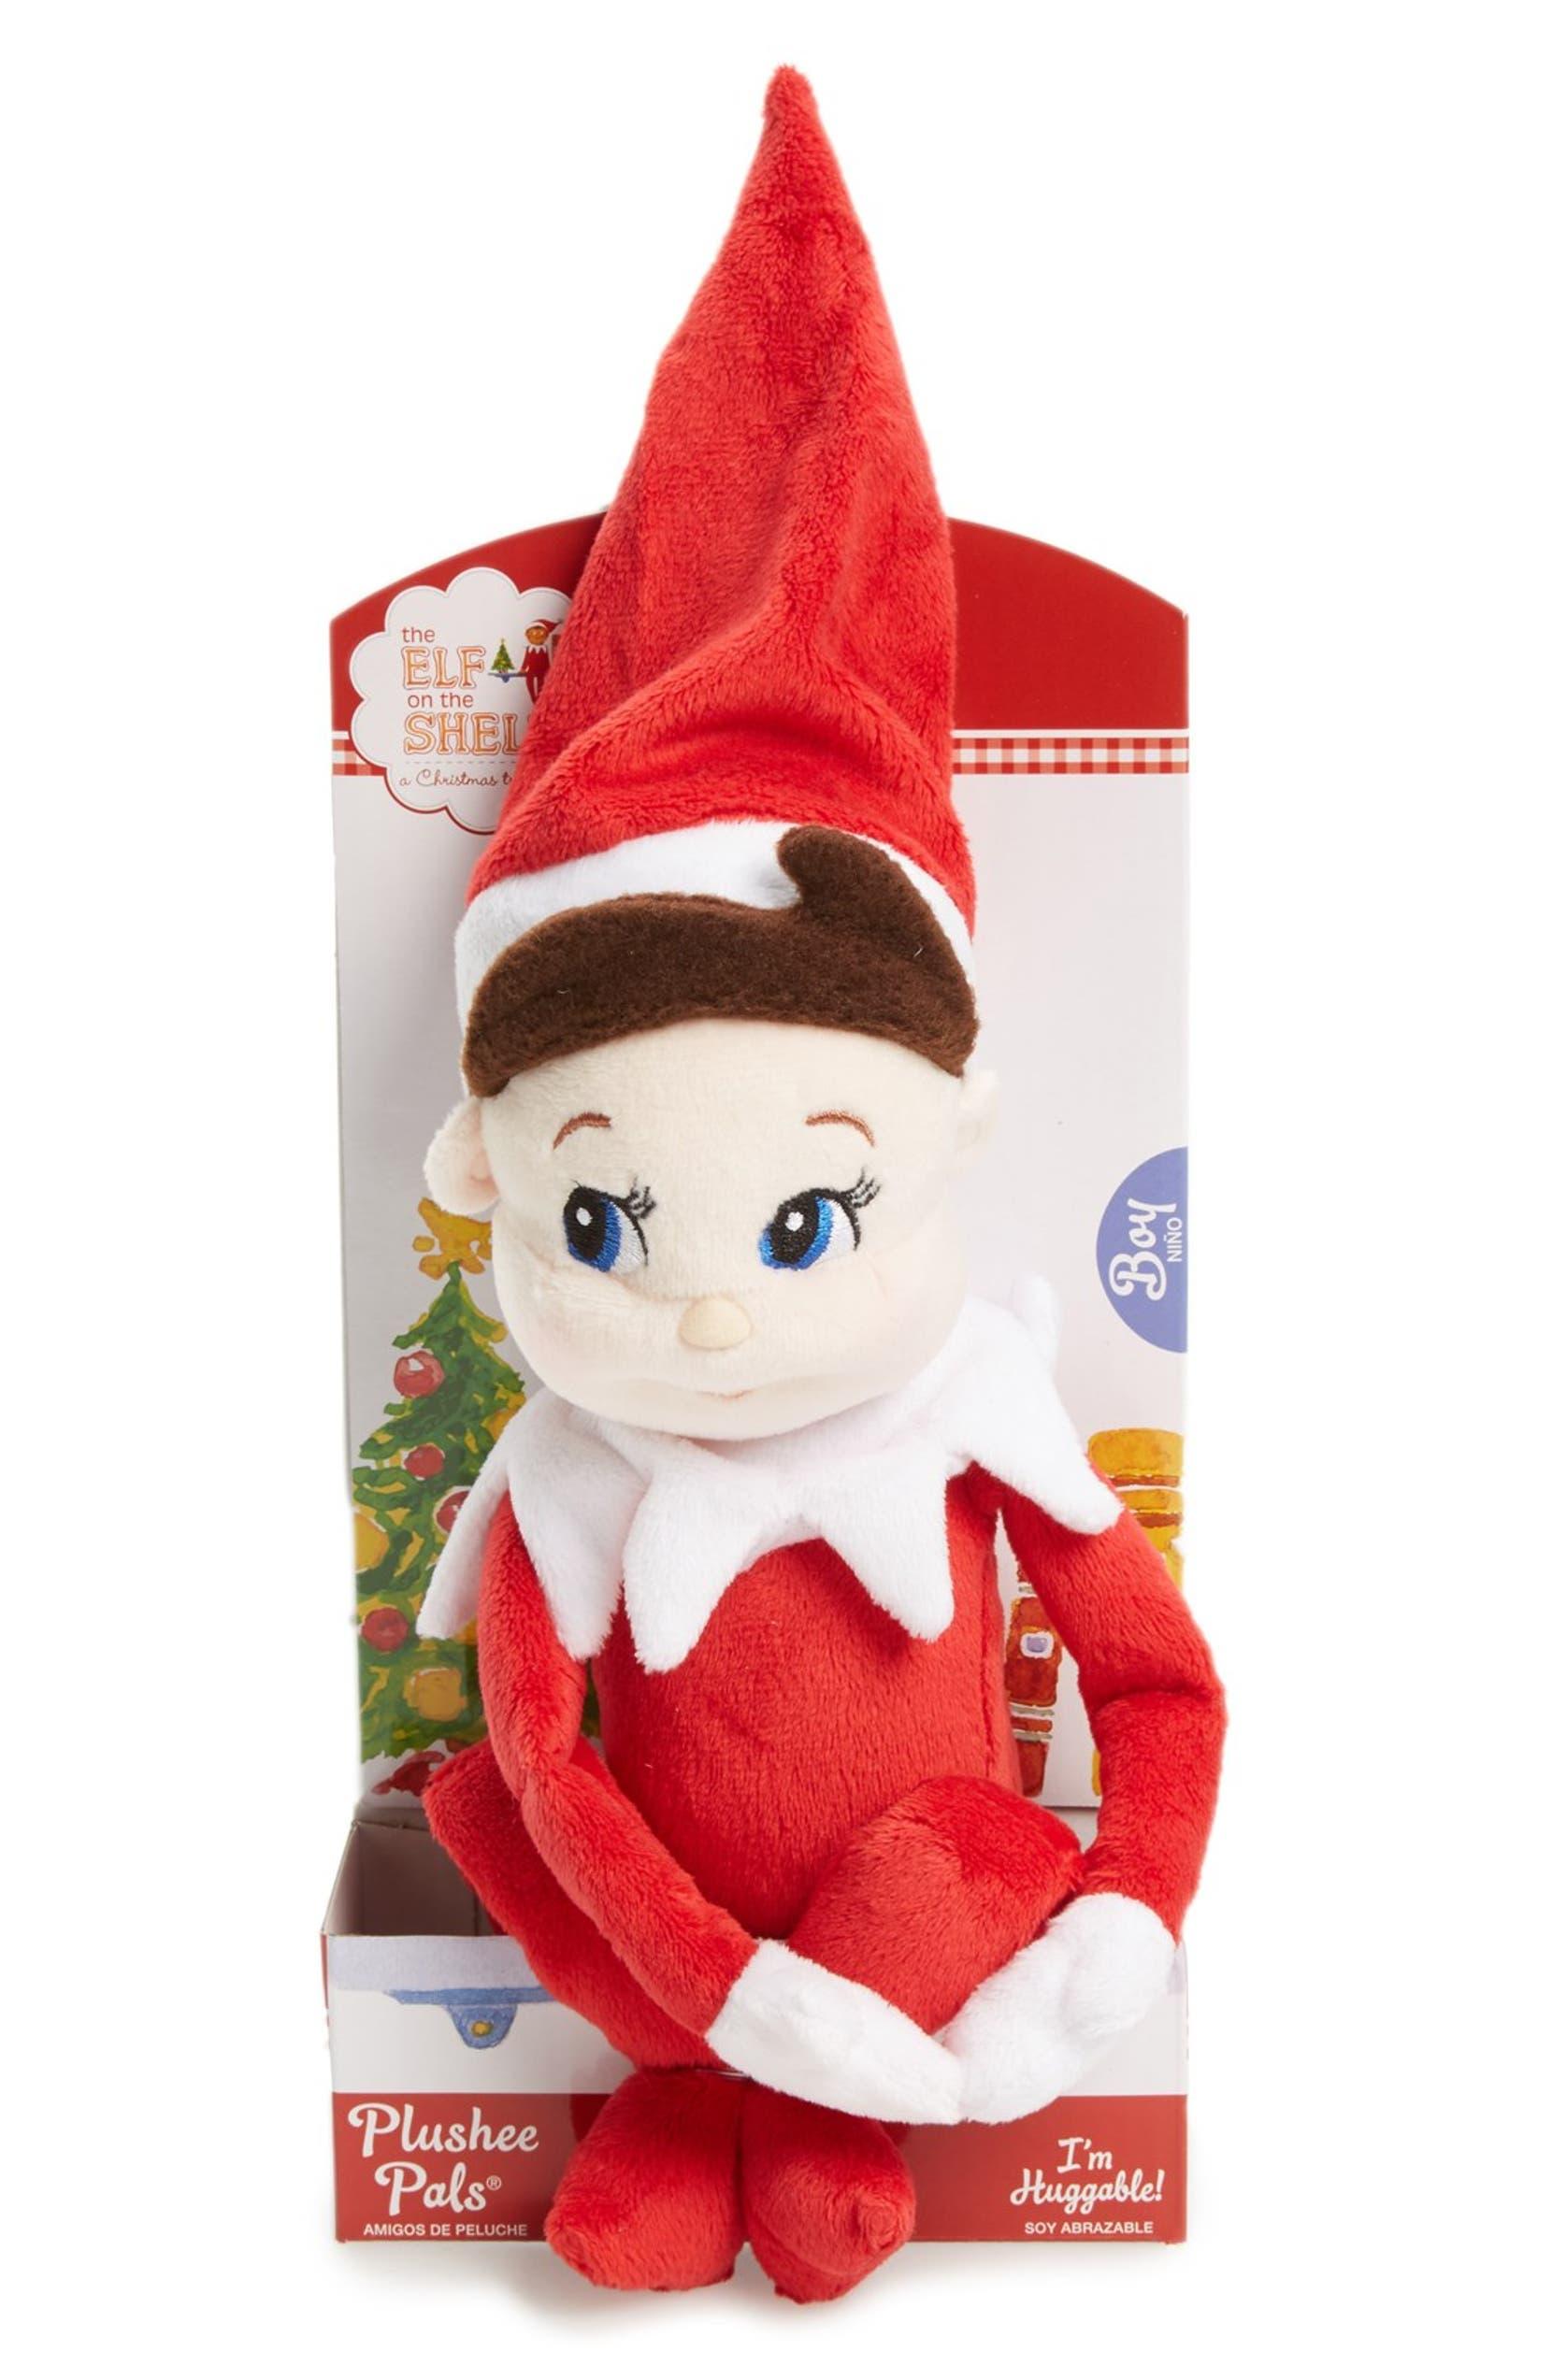 f83faded06 Elf on the Shelf Plushee Pals® Boy Scout Elf